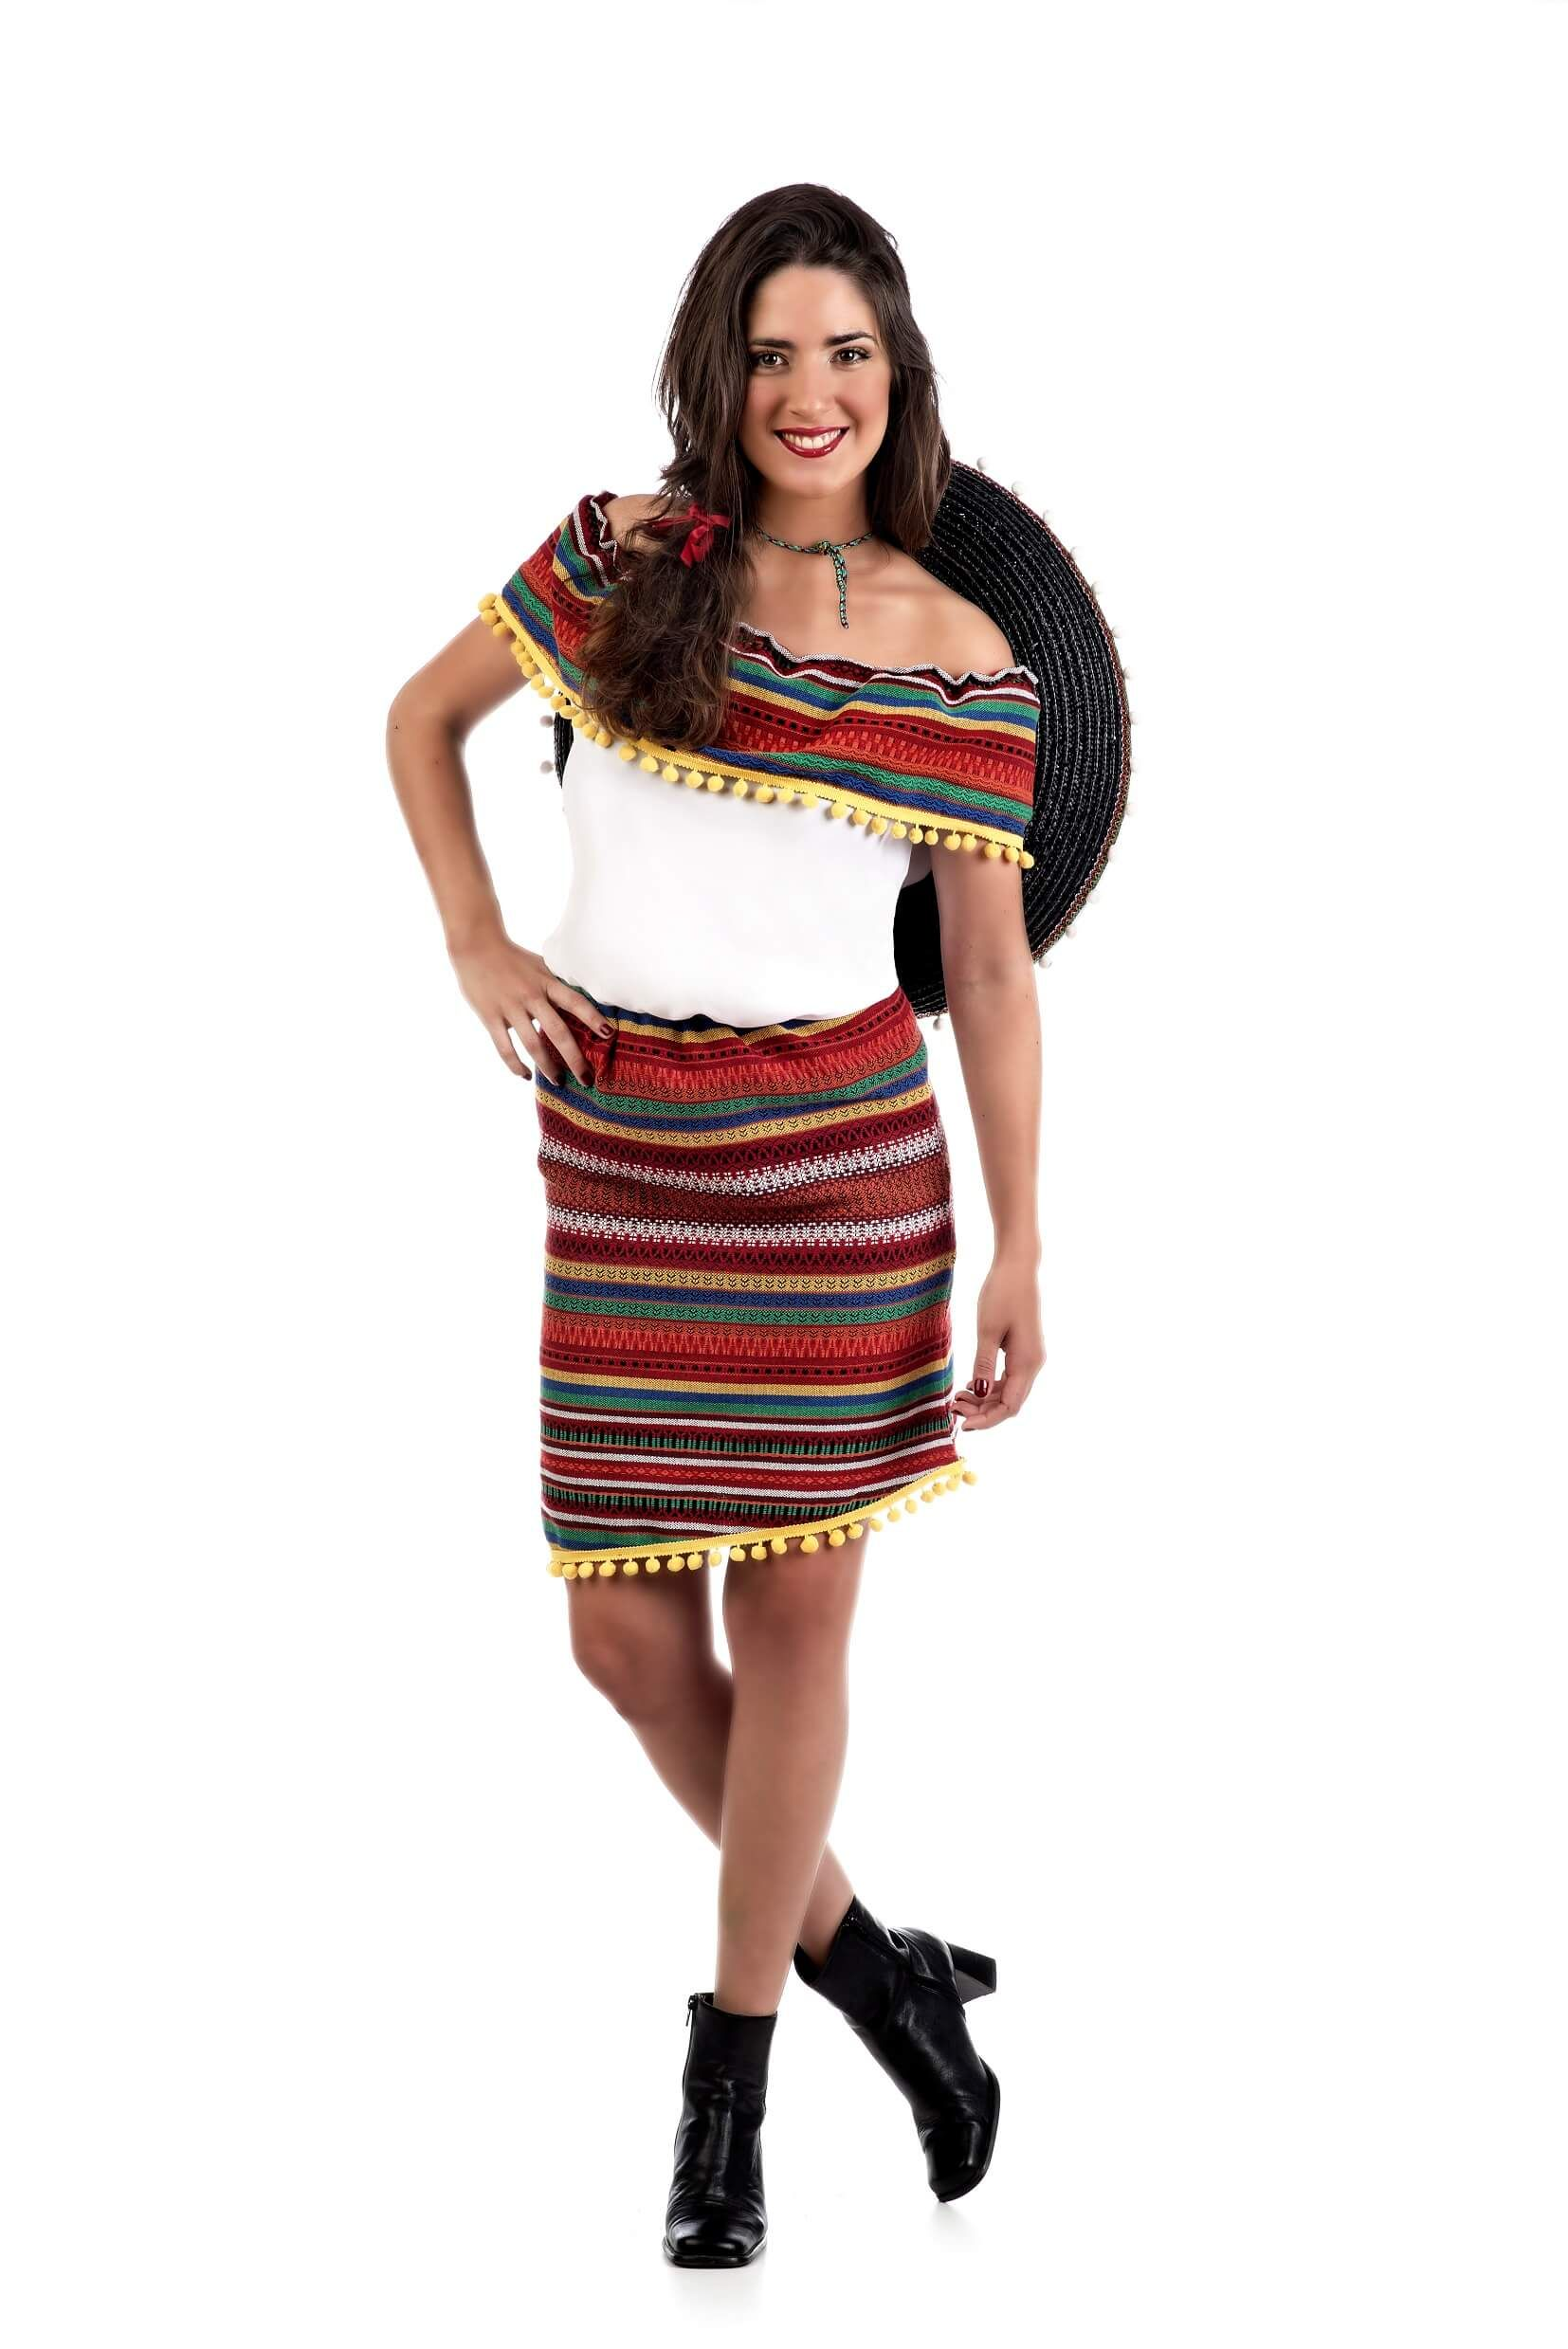 929c7a5459 Disfraz de mexicana para mujer